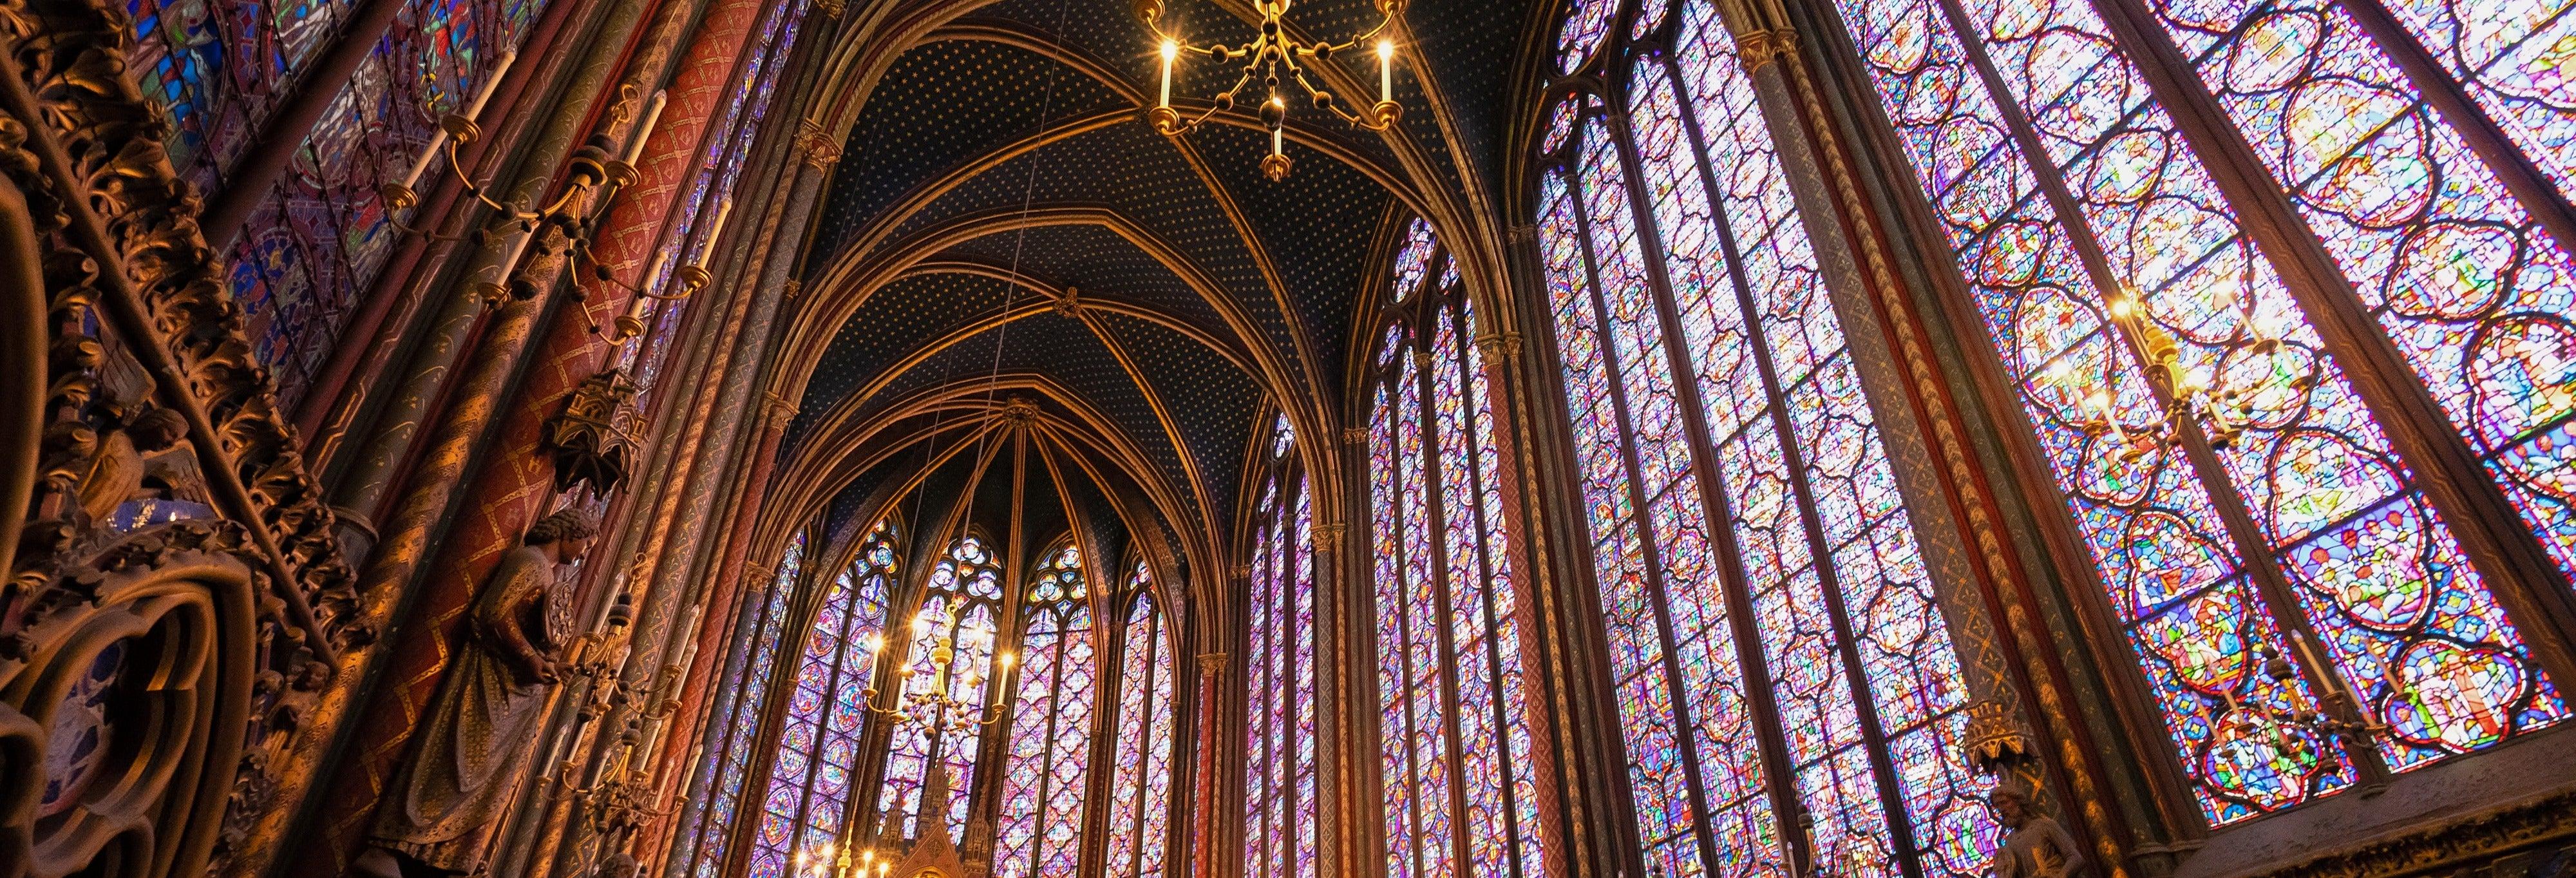 Ingresso da Conciergerie e Sainte-Chapelle sem filas